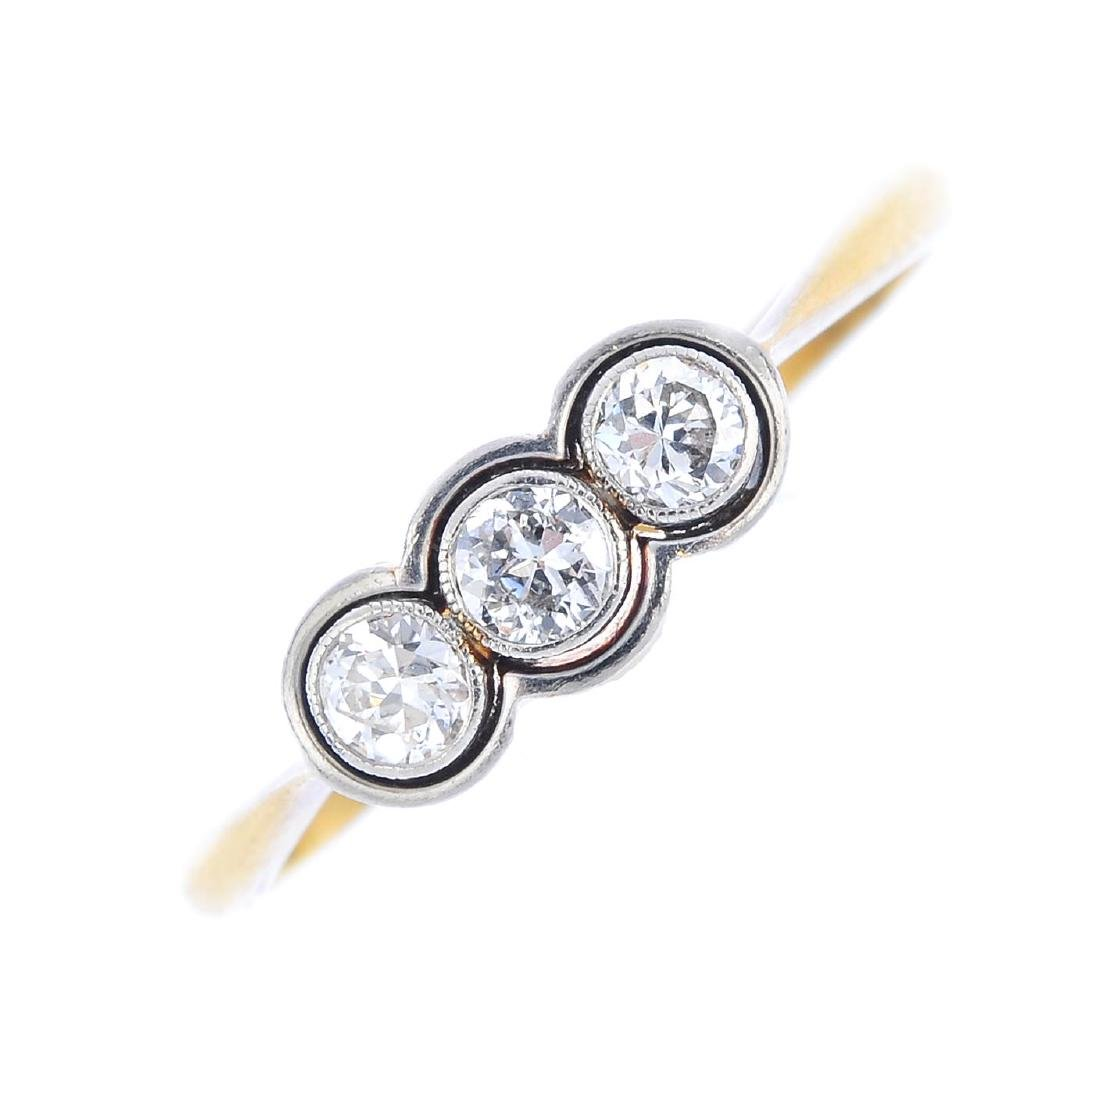 A diamond three-stone ring. The brilliant-cut diamond